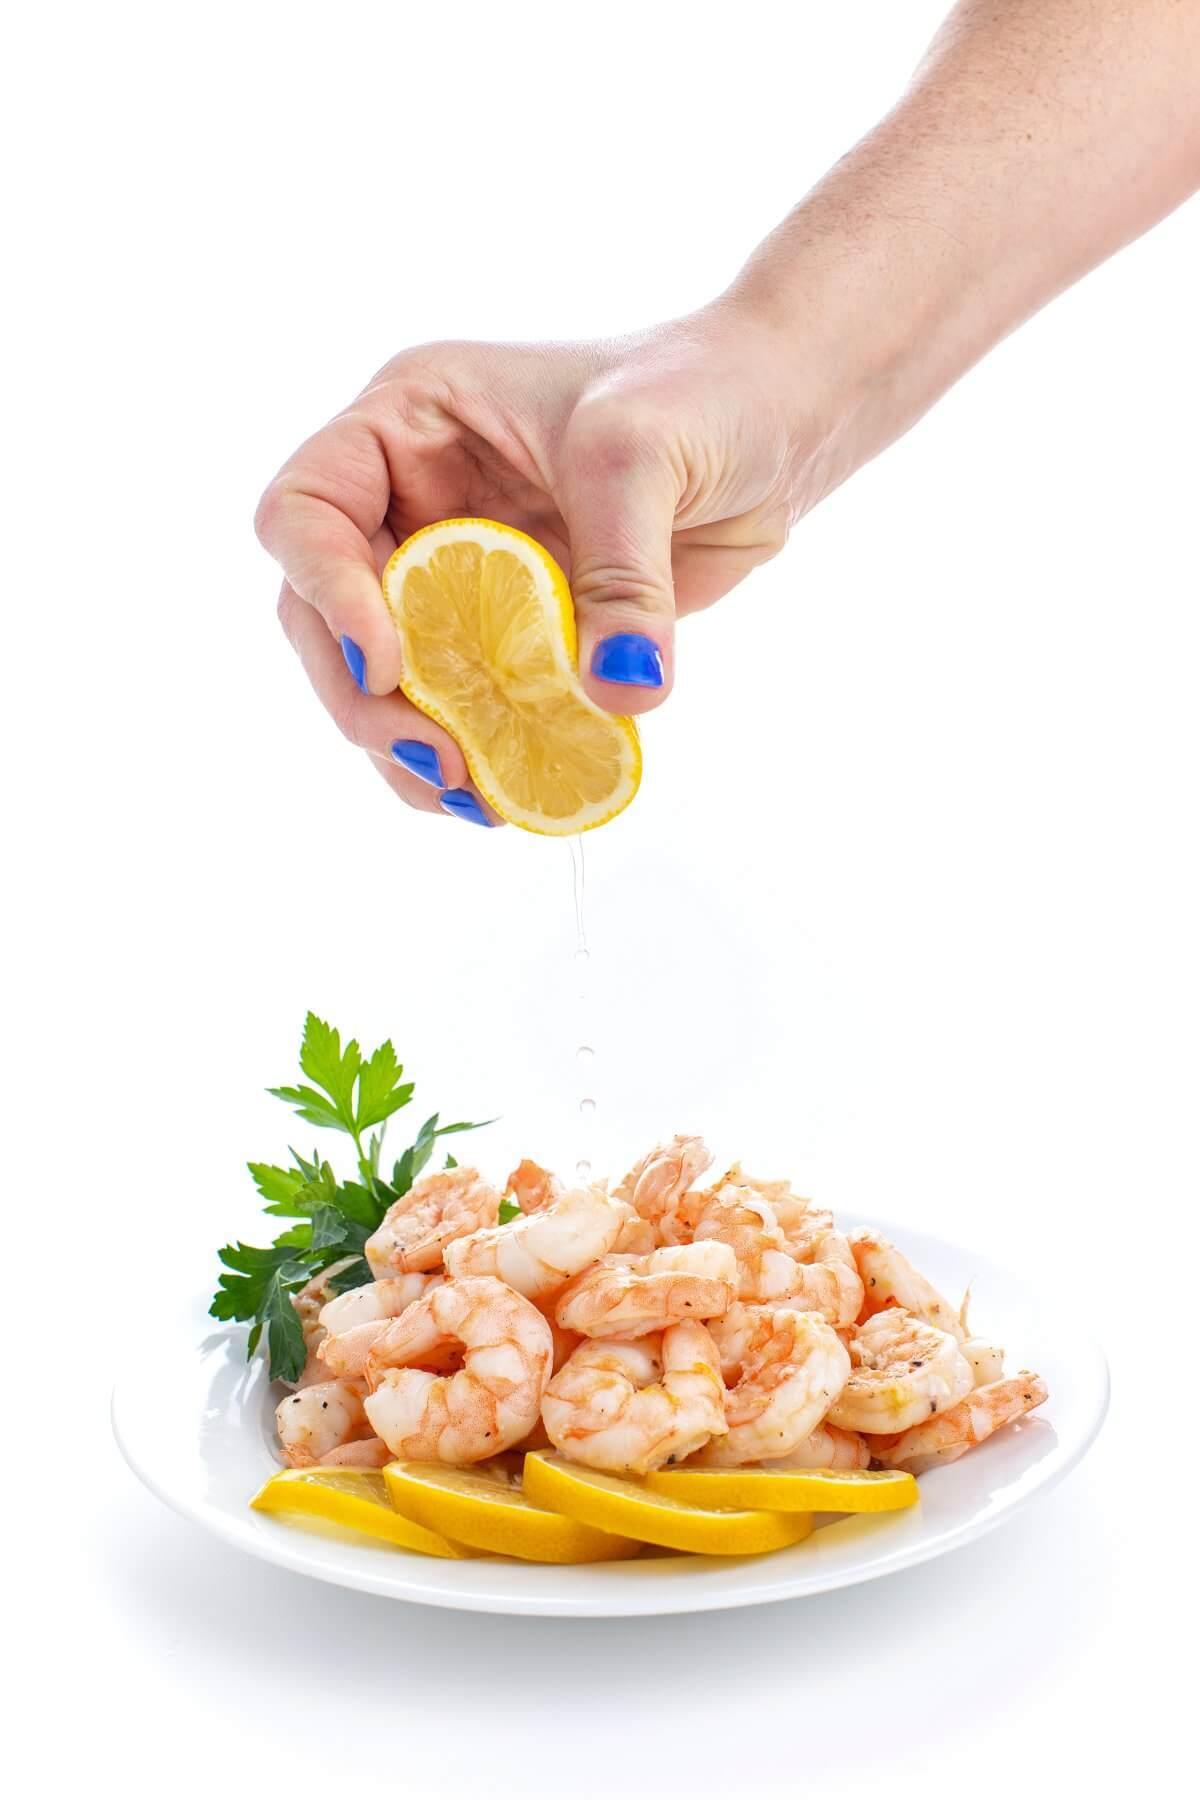 lemon being squeezed onto shrimp